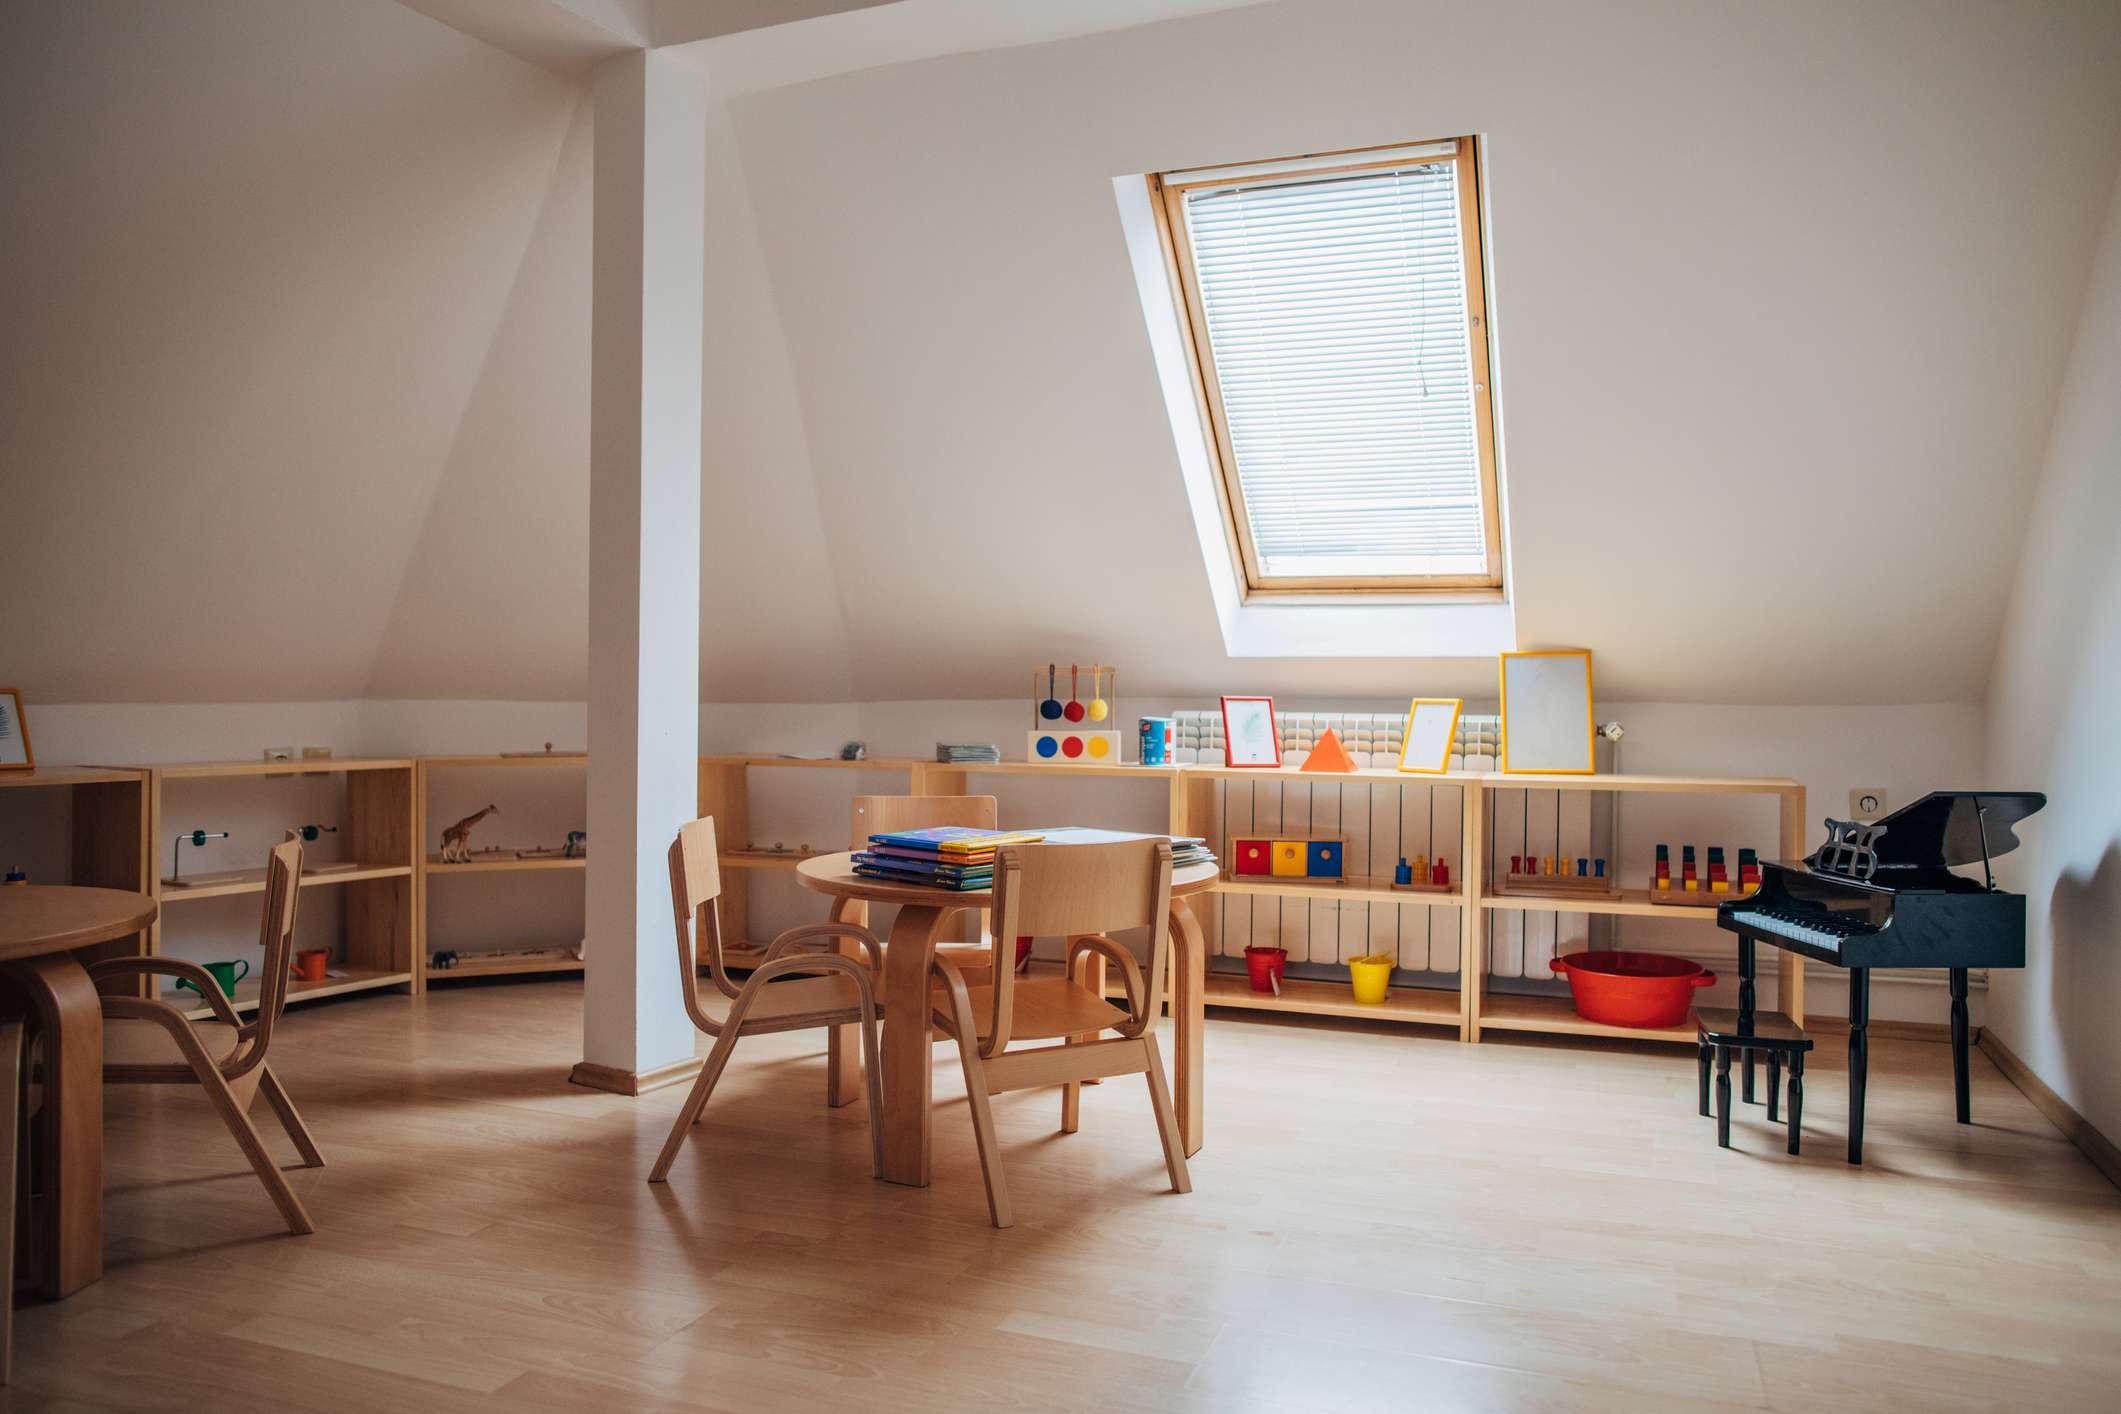 A kids play room with a skylight.